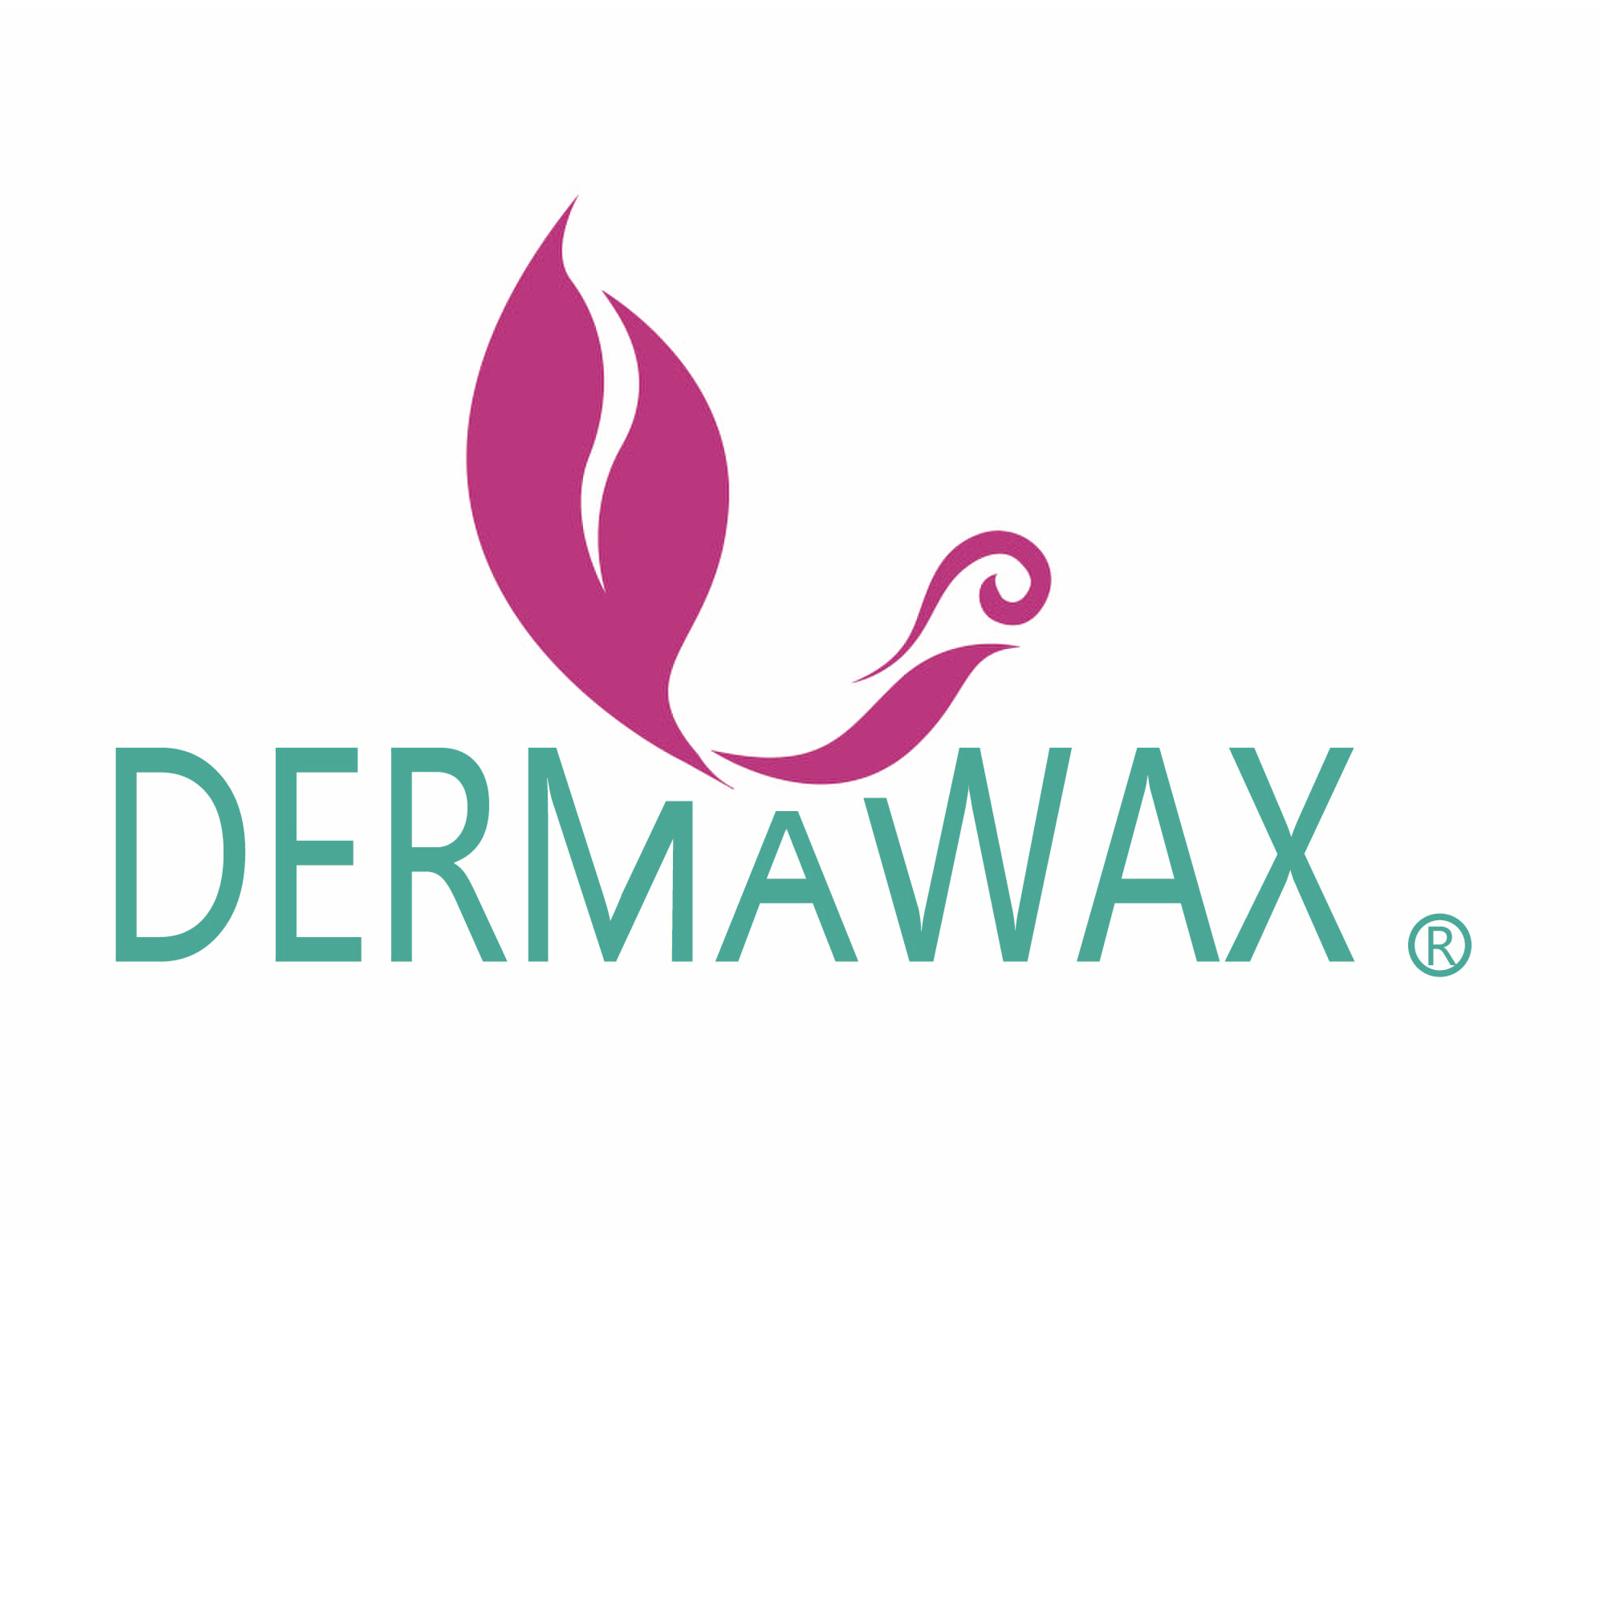 Dermawax